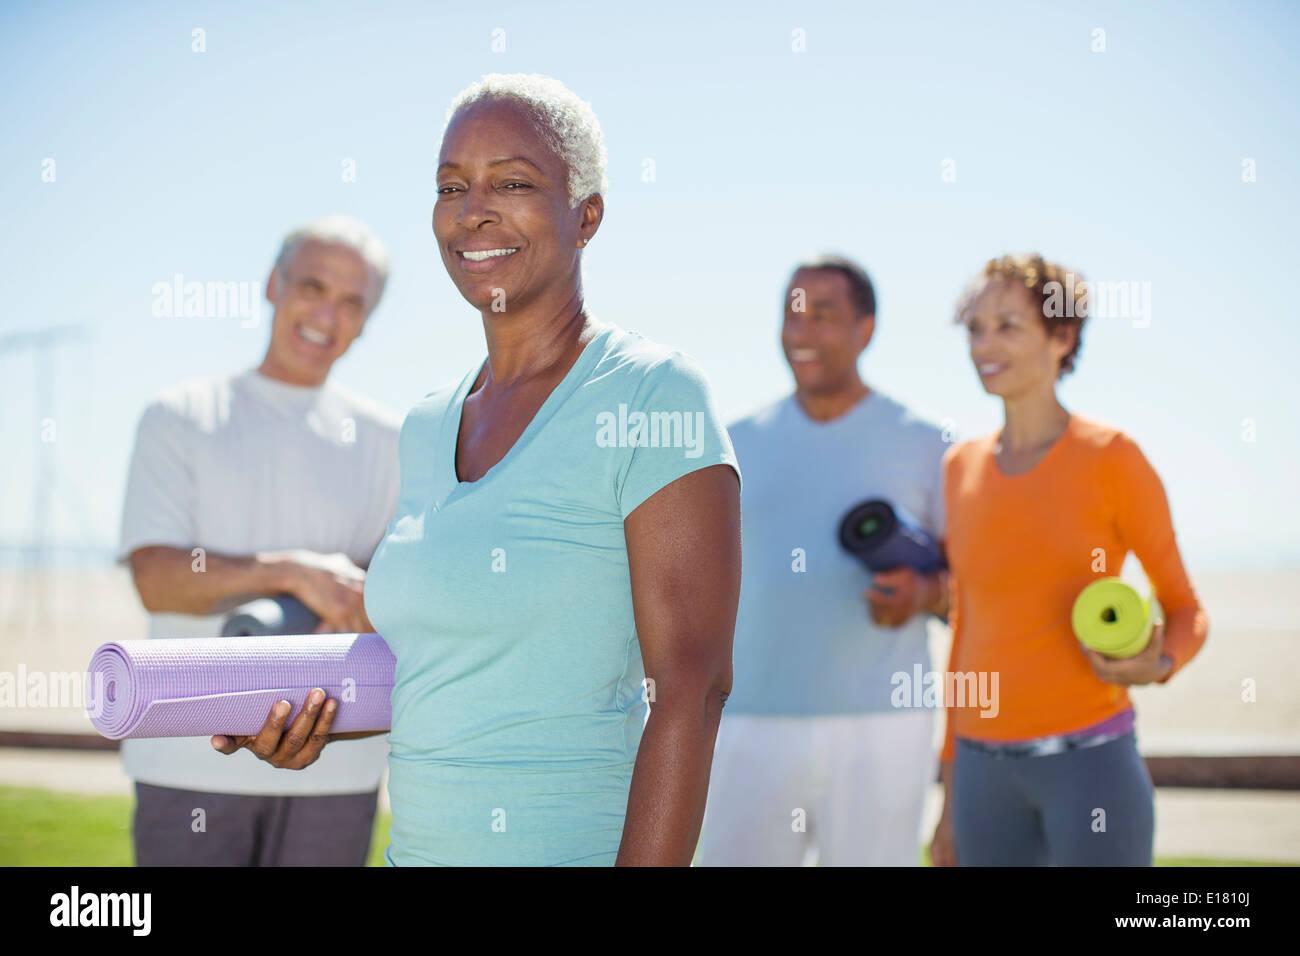 Porträt der selbstbewusste ältere Frau mit Yoga-Matte im park Stockbild